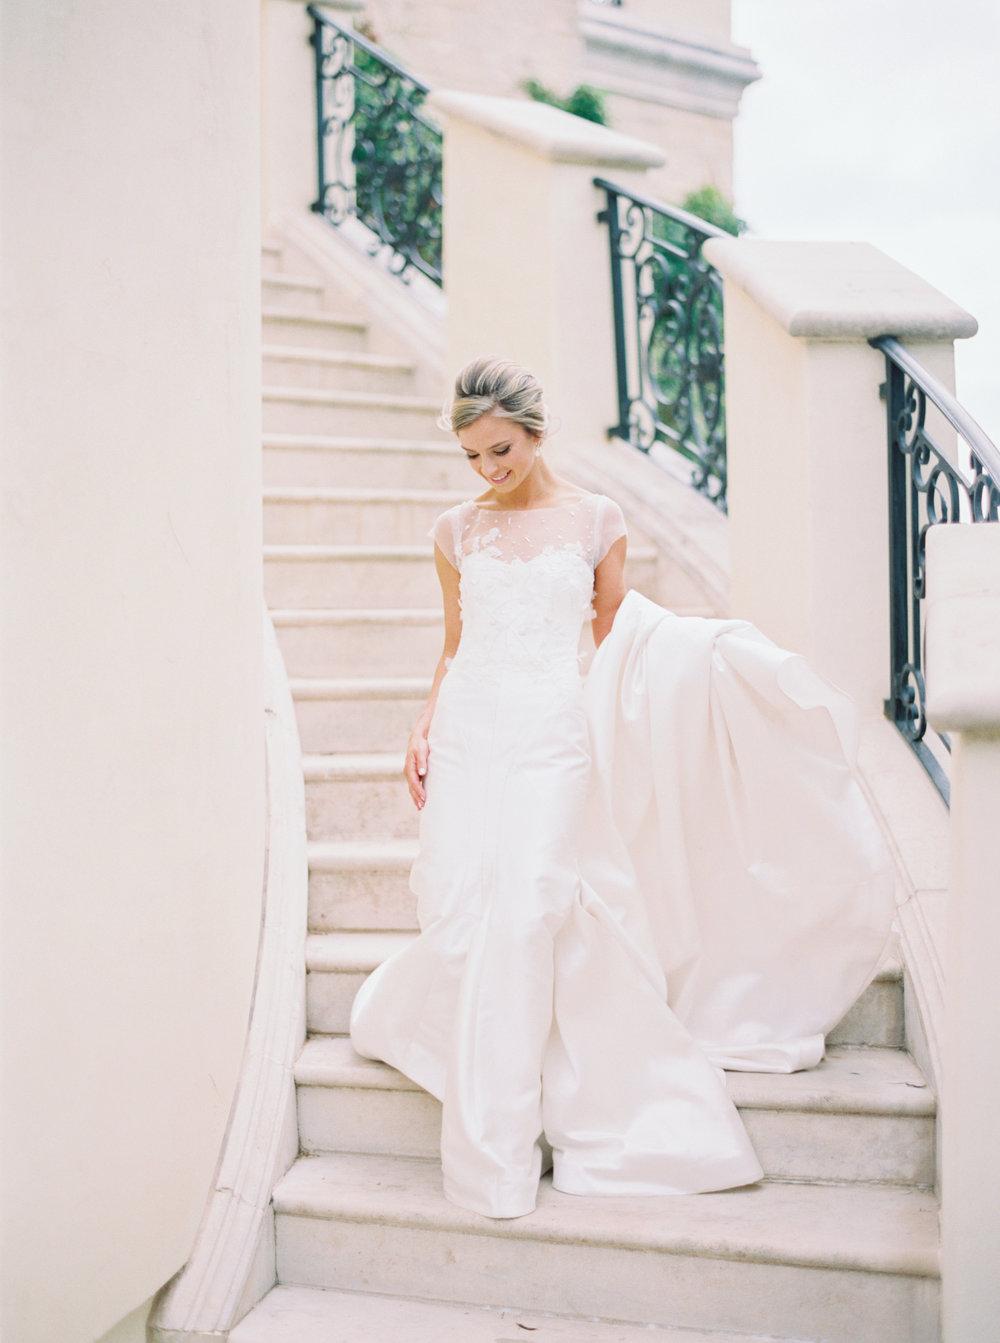 jenna-mcelroy-bridal-portraits-a-southern-tradition-3